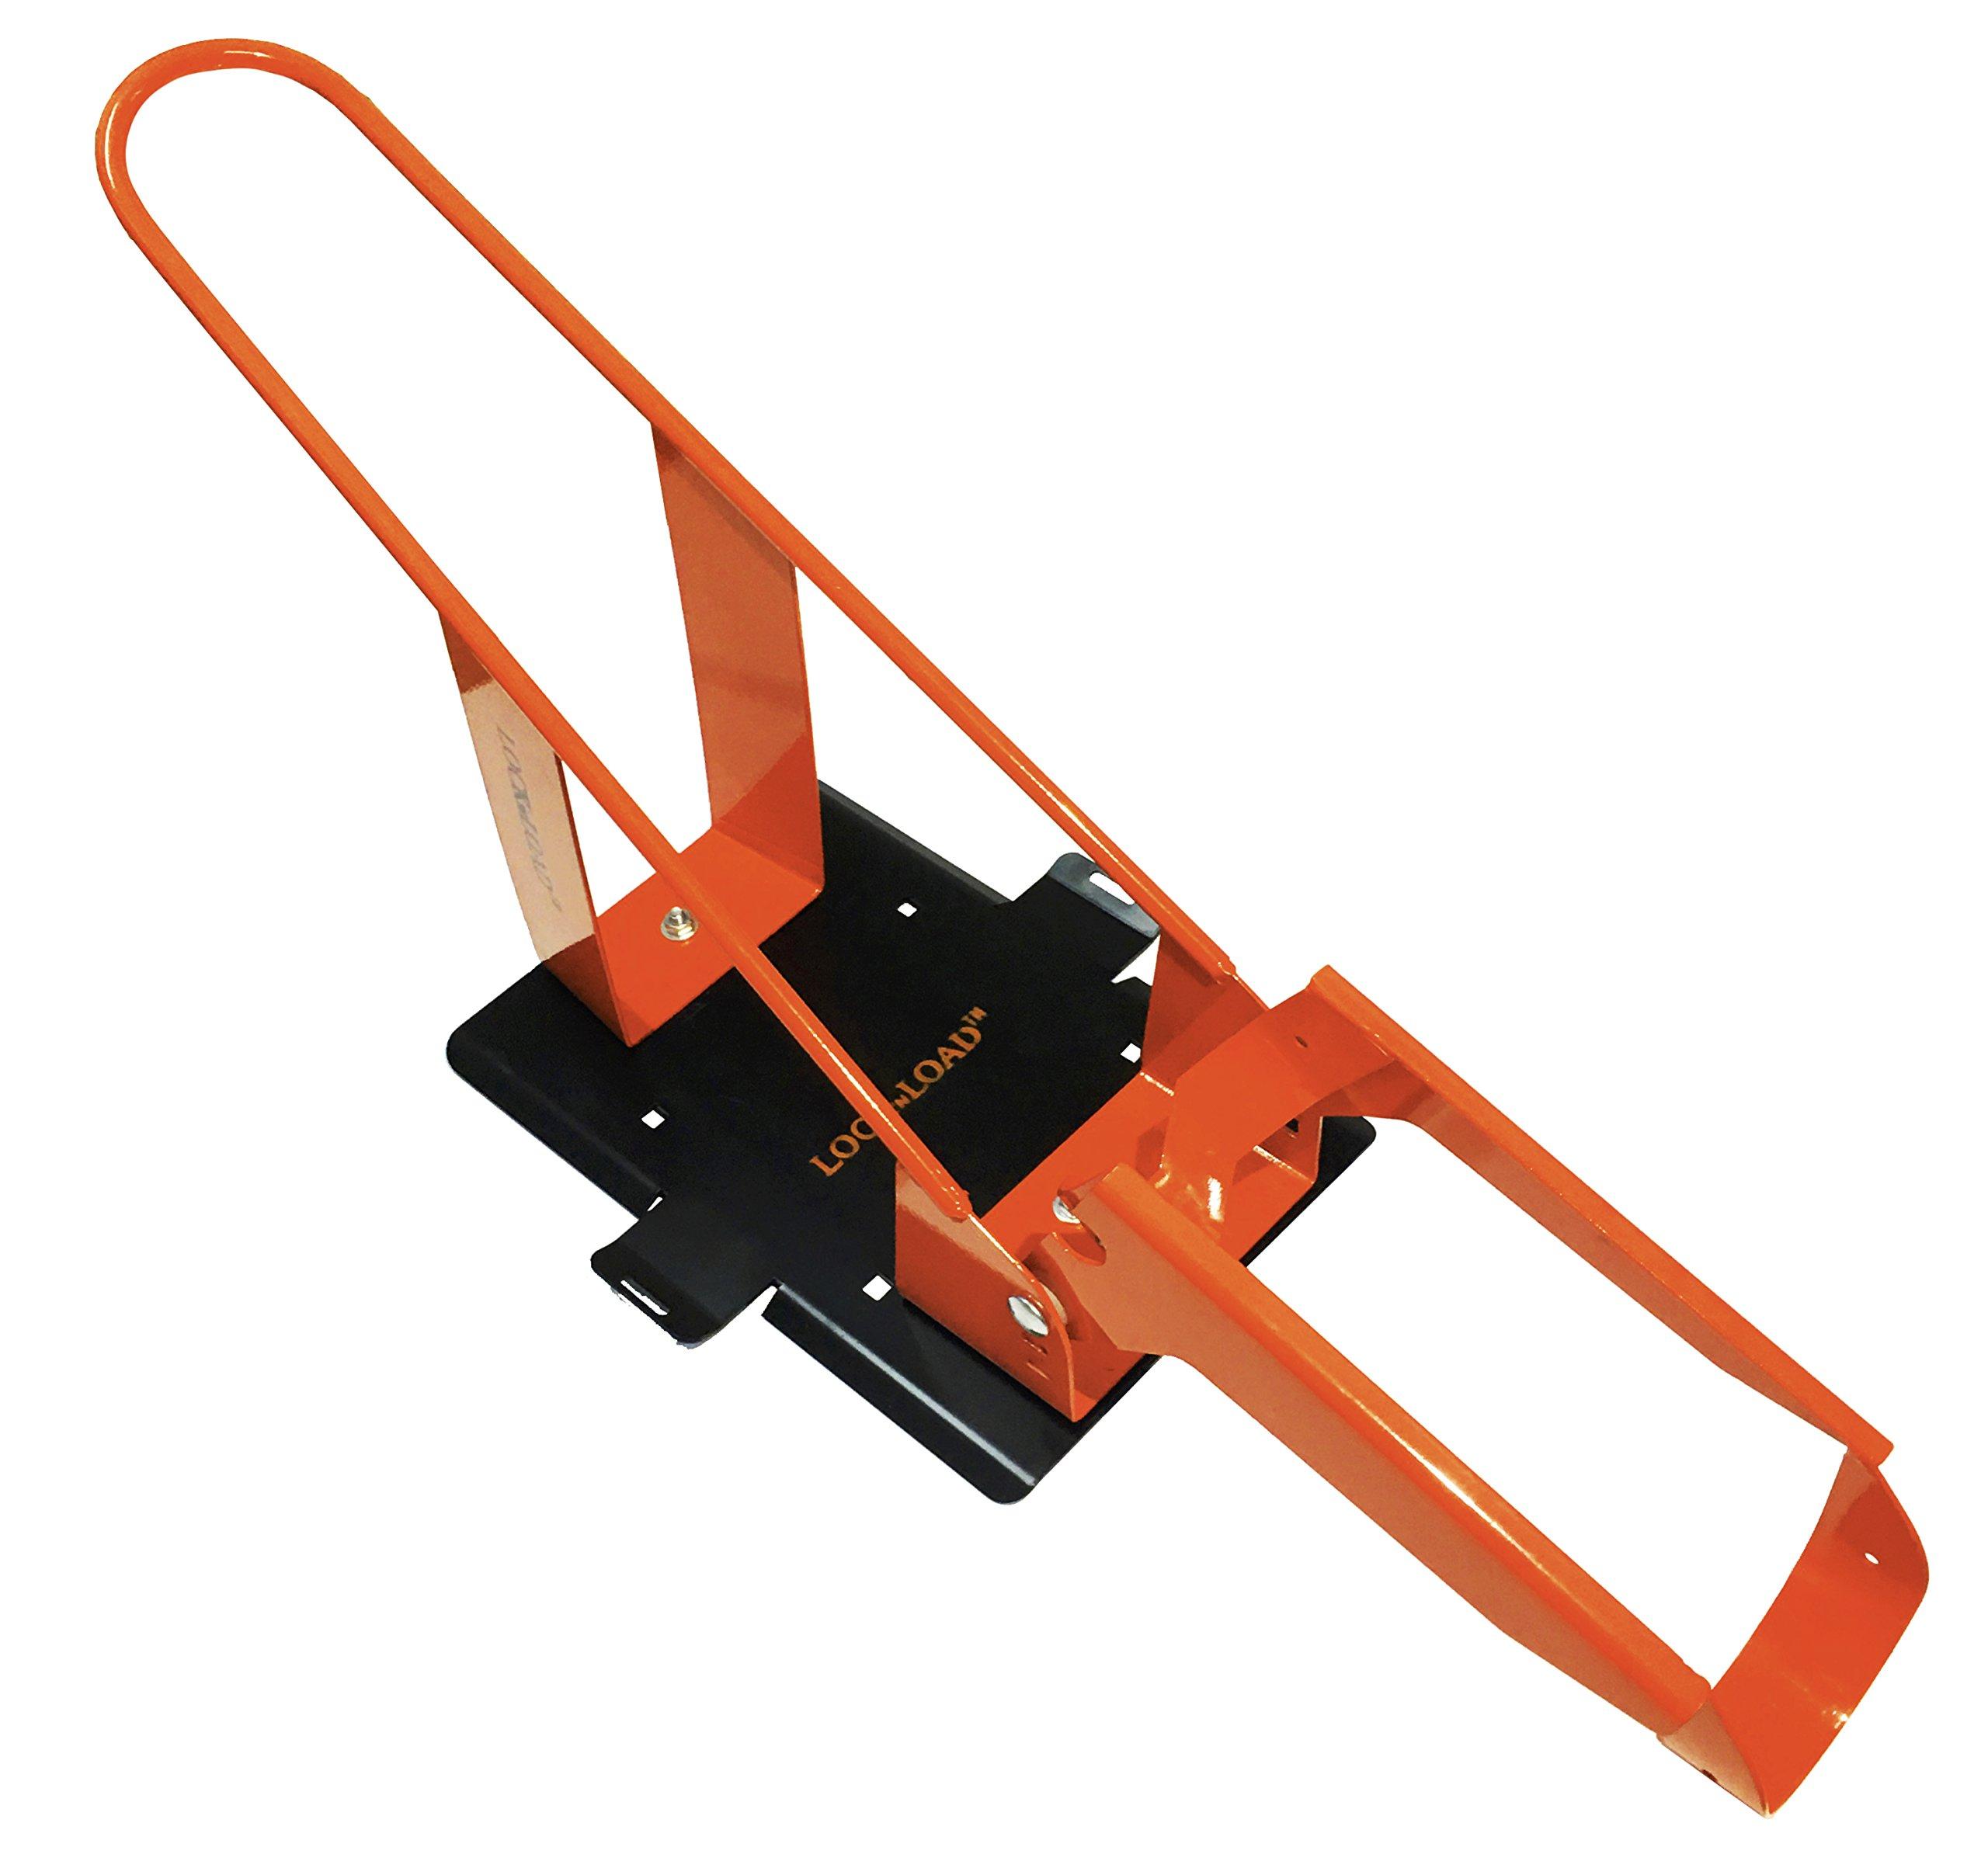 Lock N Load BK500 Orange/Black Wheel Chock